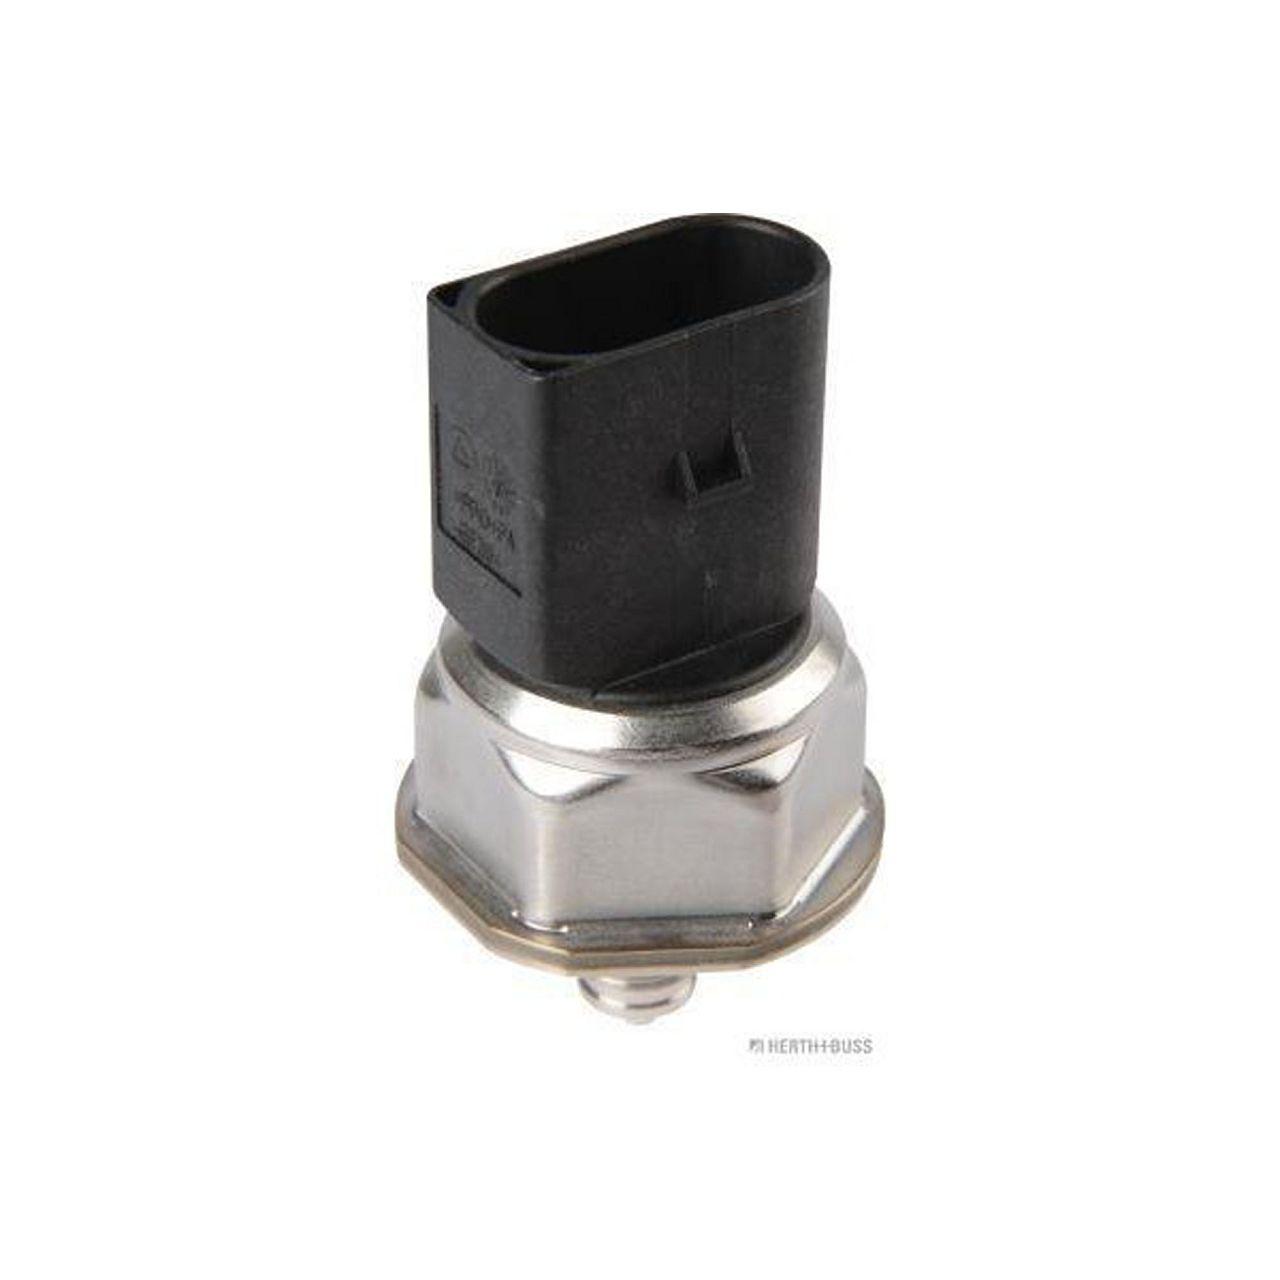 HERTH+BUSS ELPARTS Kraftstoffdrucksensor für MERCEDES W204 W212 A207 C207 SLK R